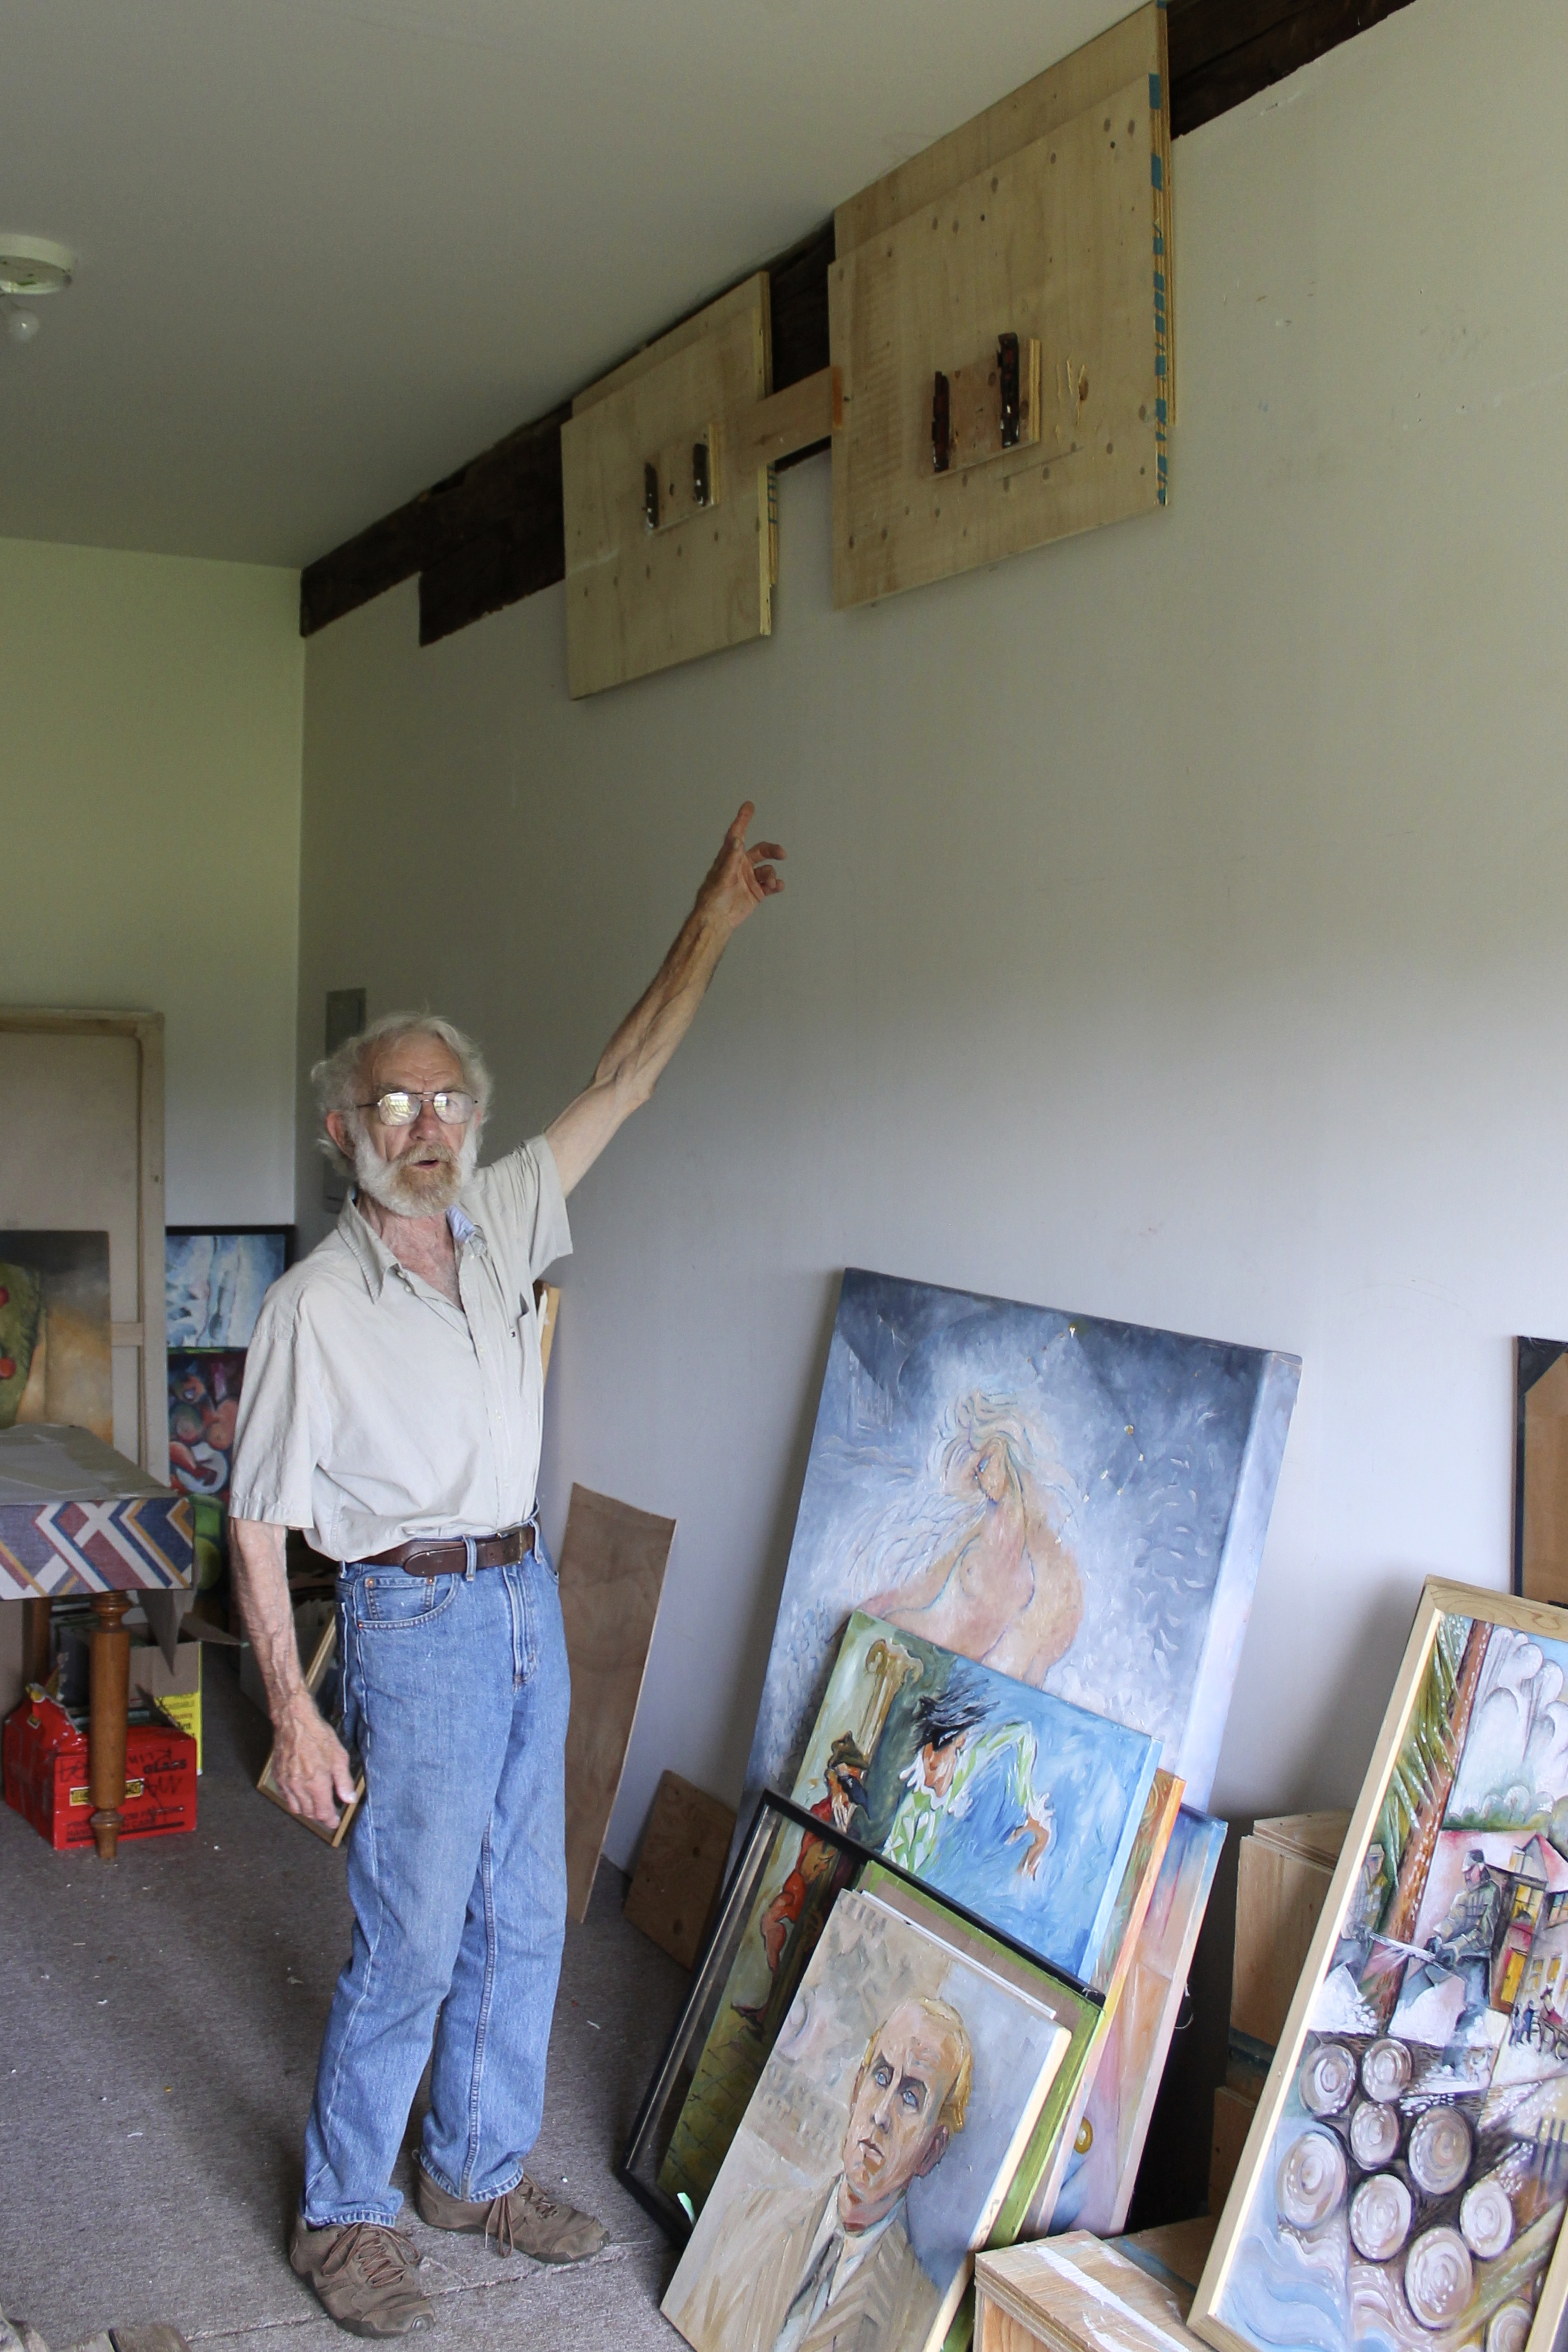 The Quiet Painter, by Michelle Annette Tremblay, Photo of Arne Roosman by Michelle Annette Tremblay